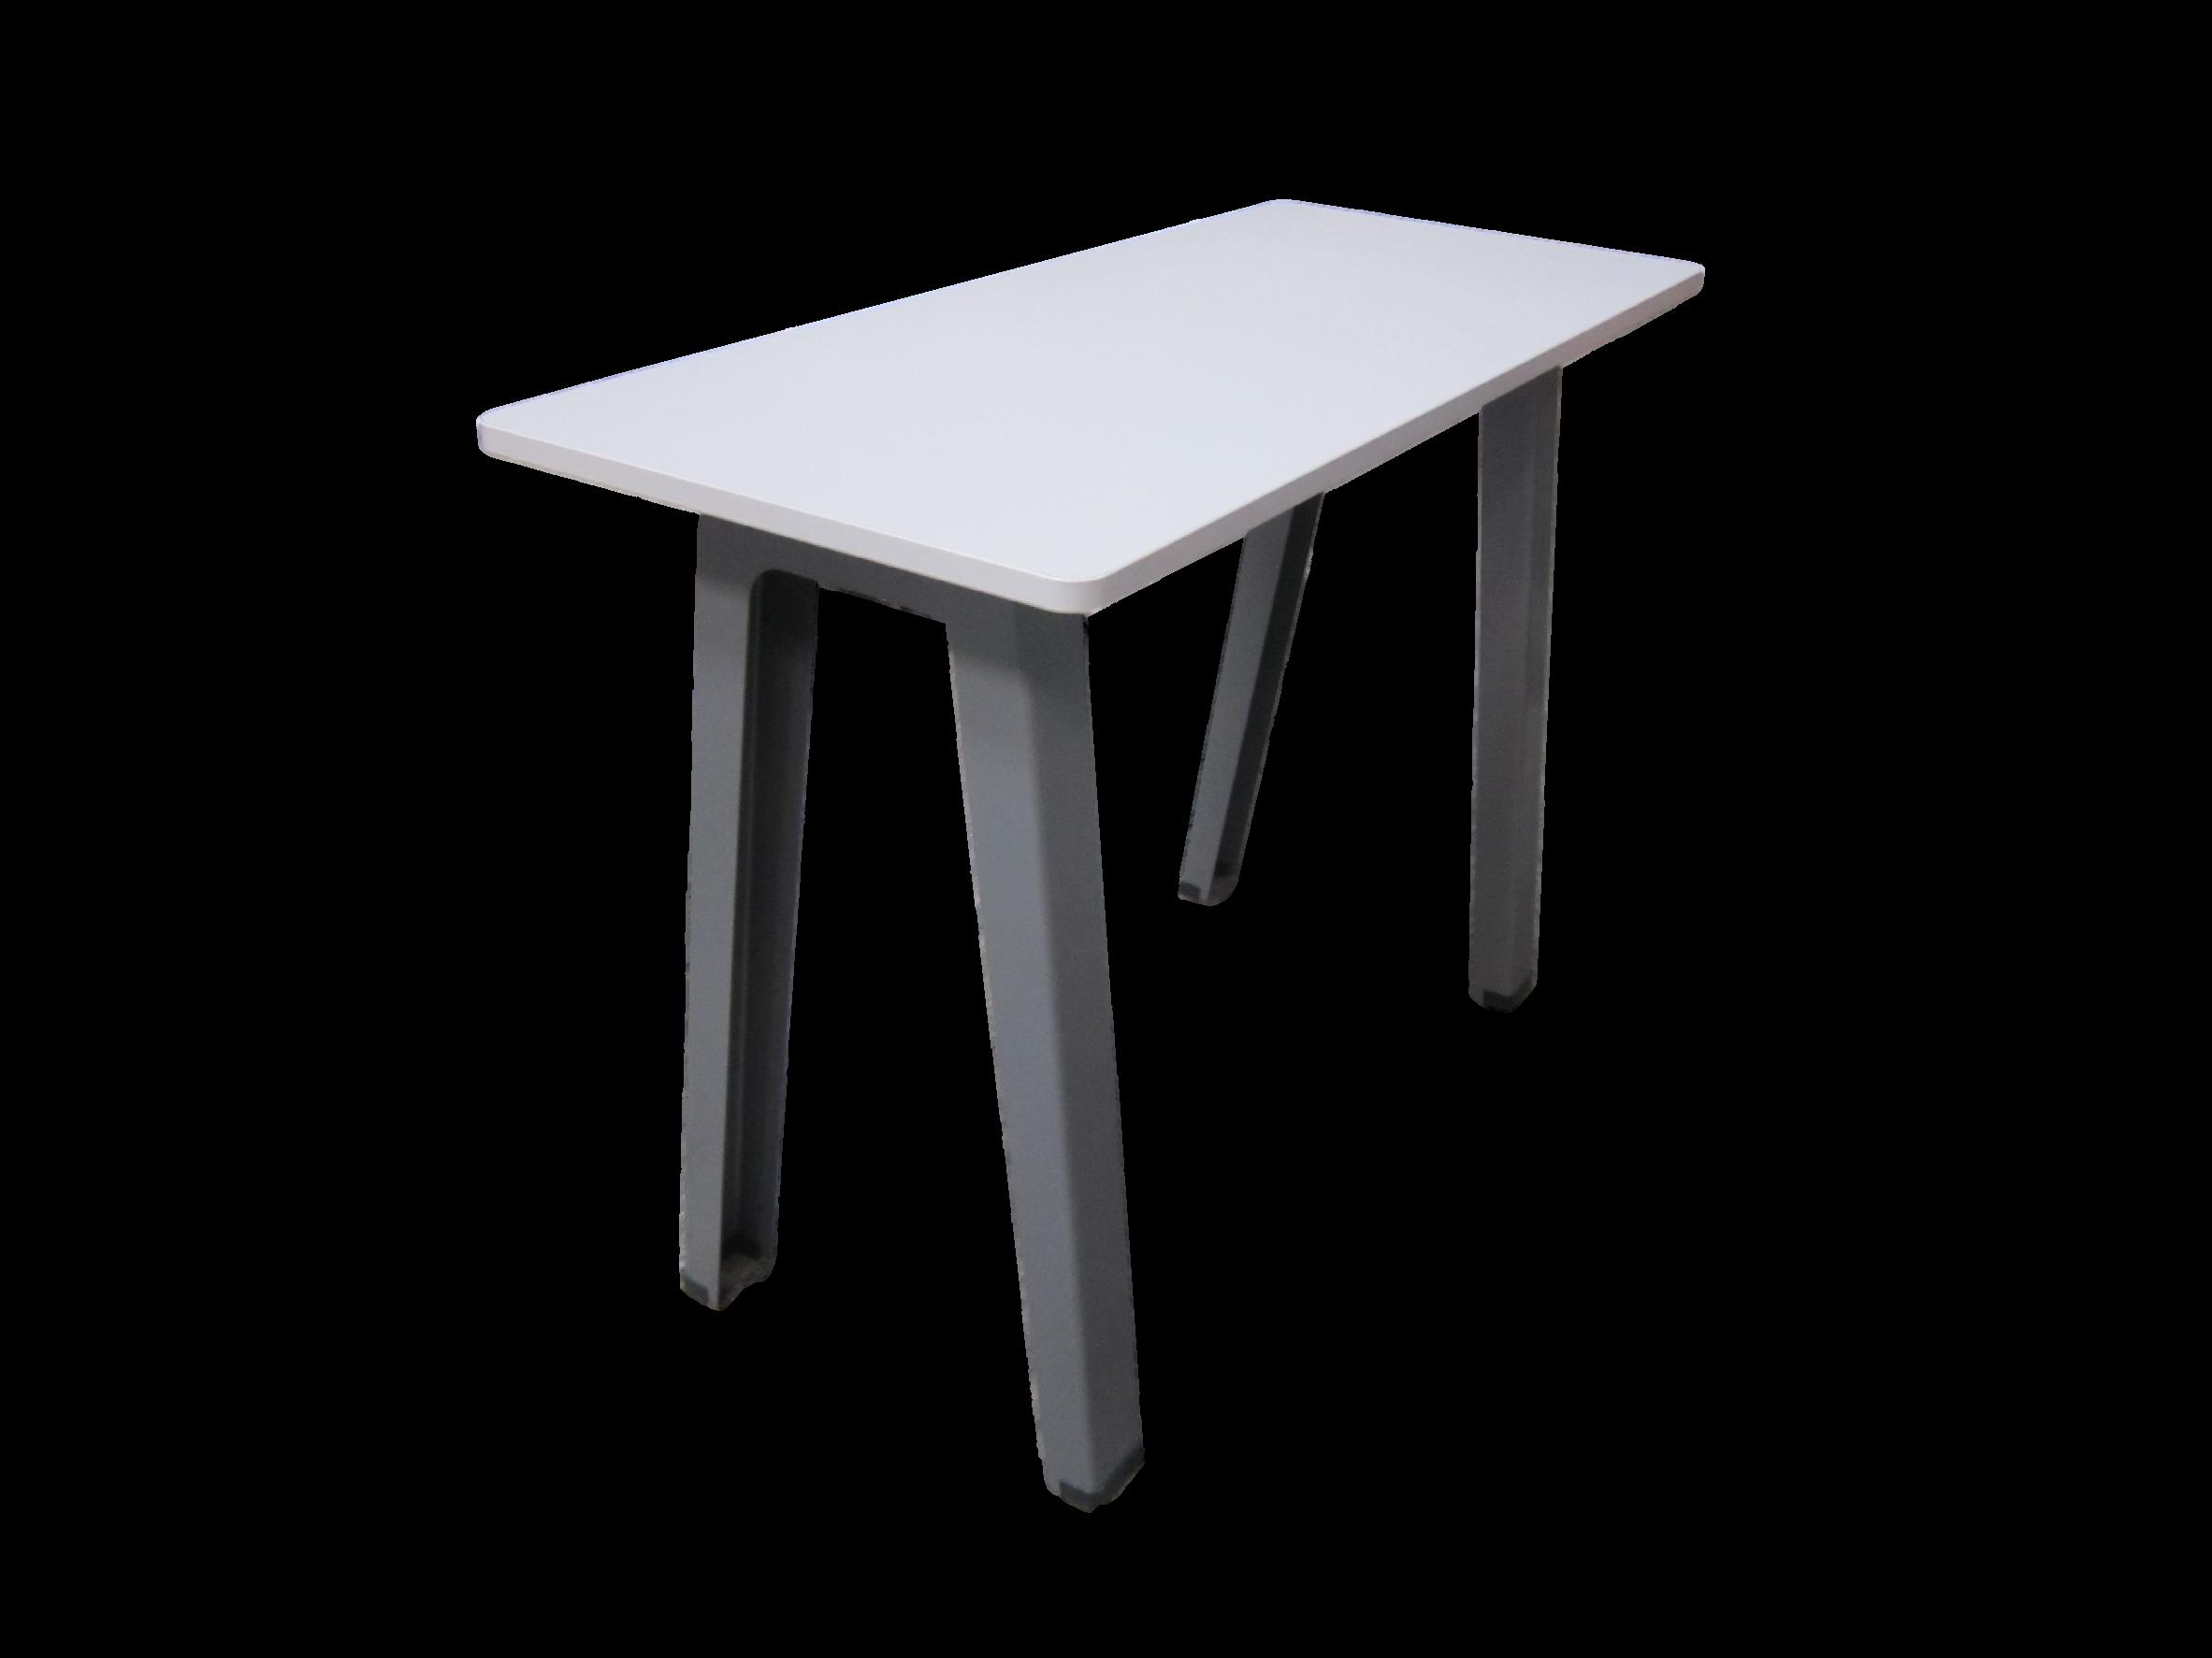 table haute steelcase b free. Black Bedroom Furniture Sets. Home Design Ideas